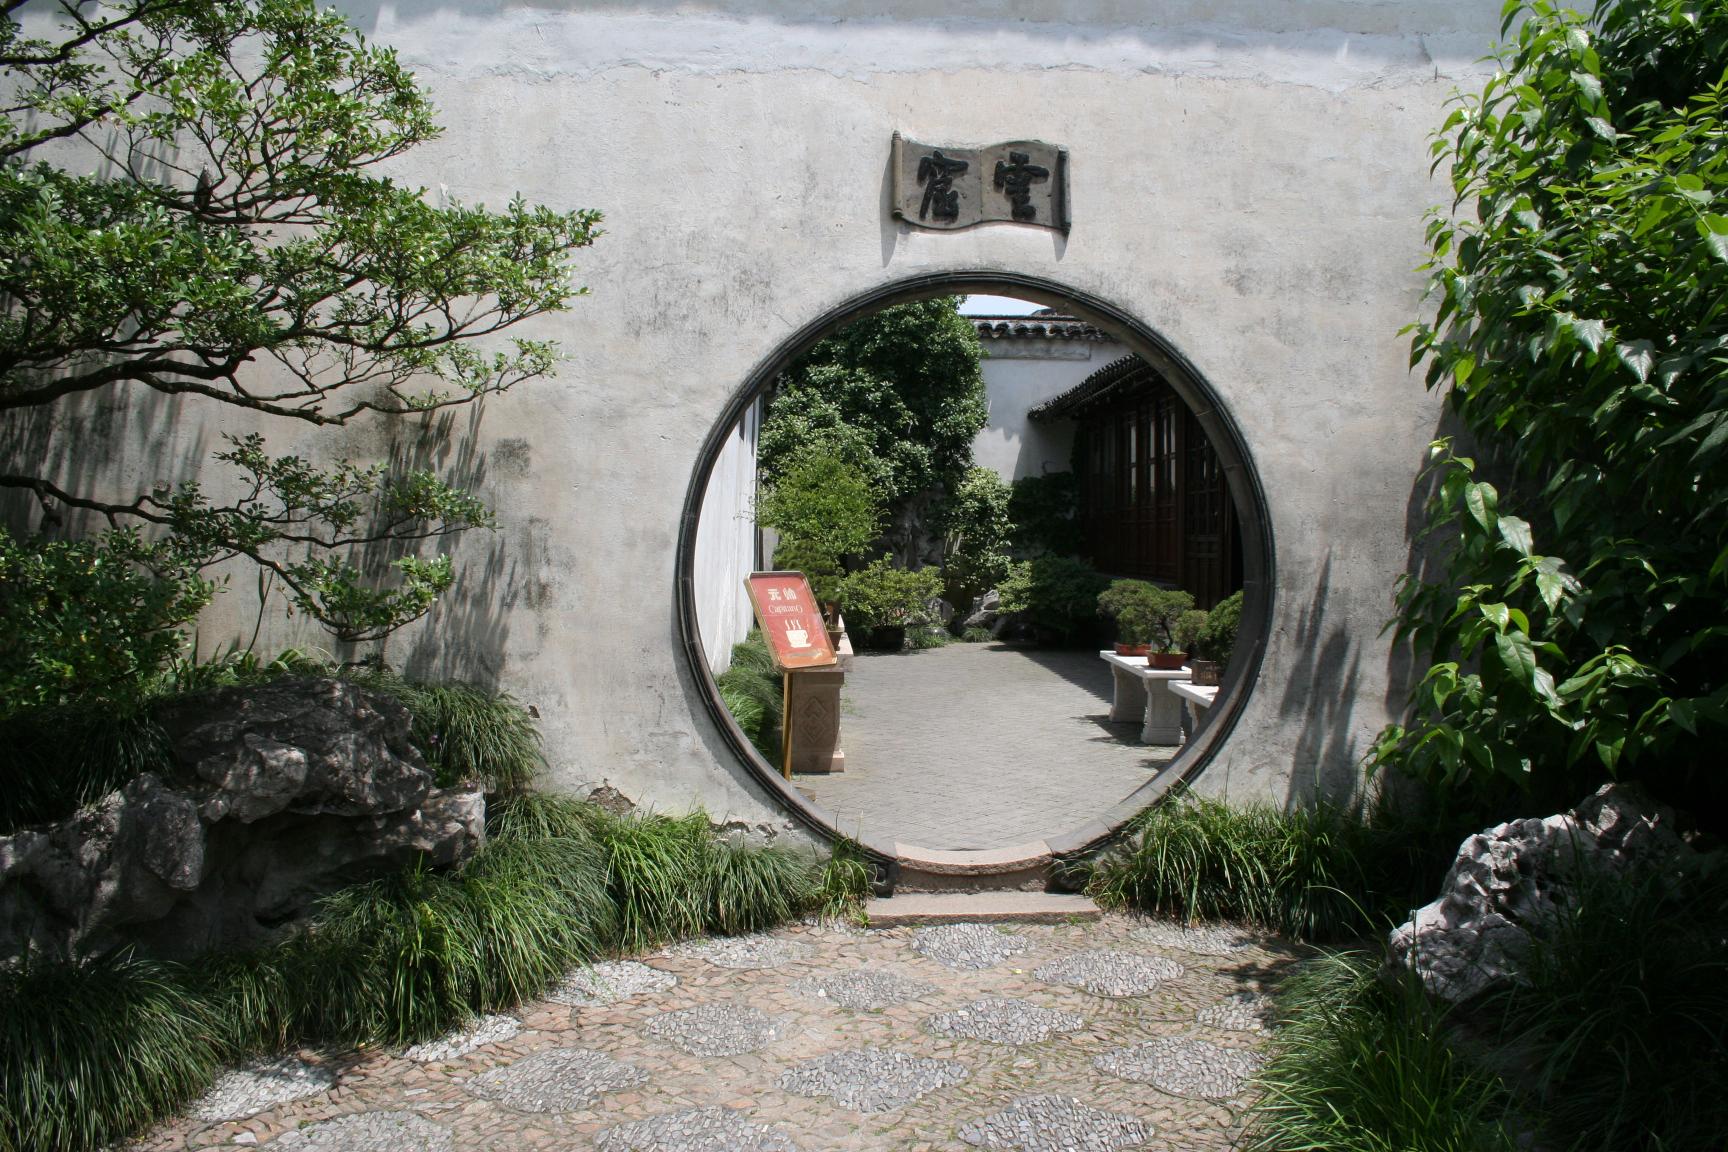 chinese architecture (Nidhi M)